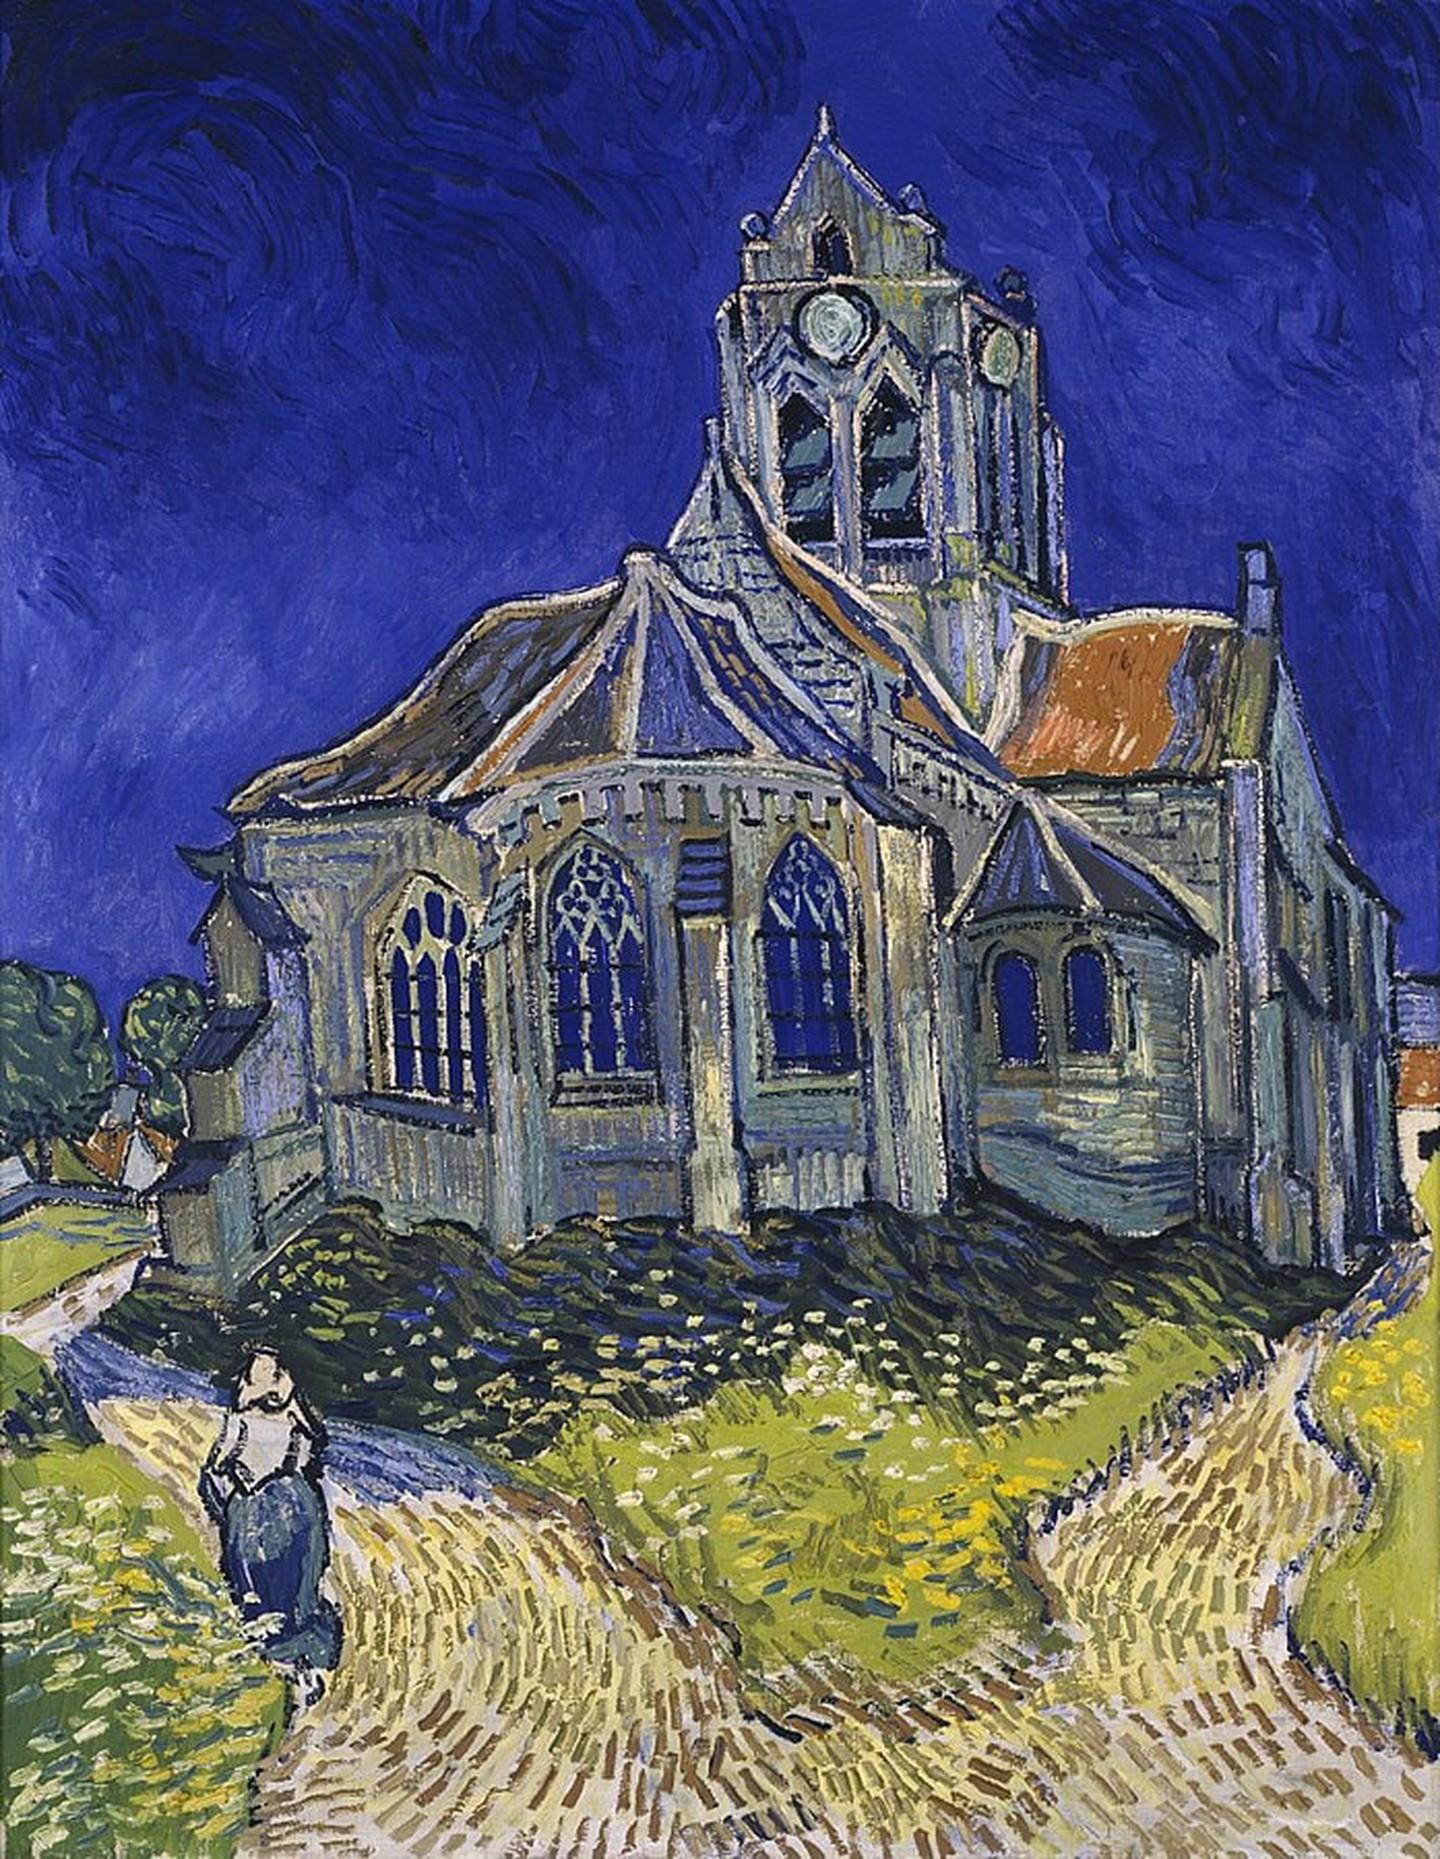 Vincent Van Gogh, 'The Church at Auvers', 1890